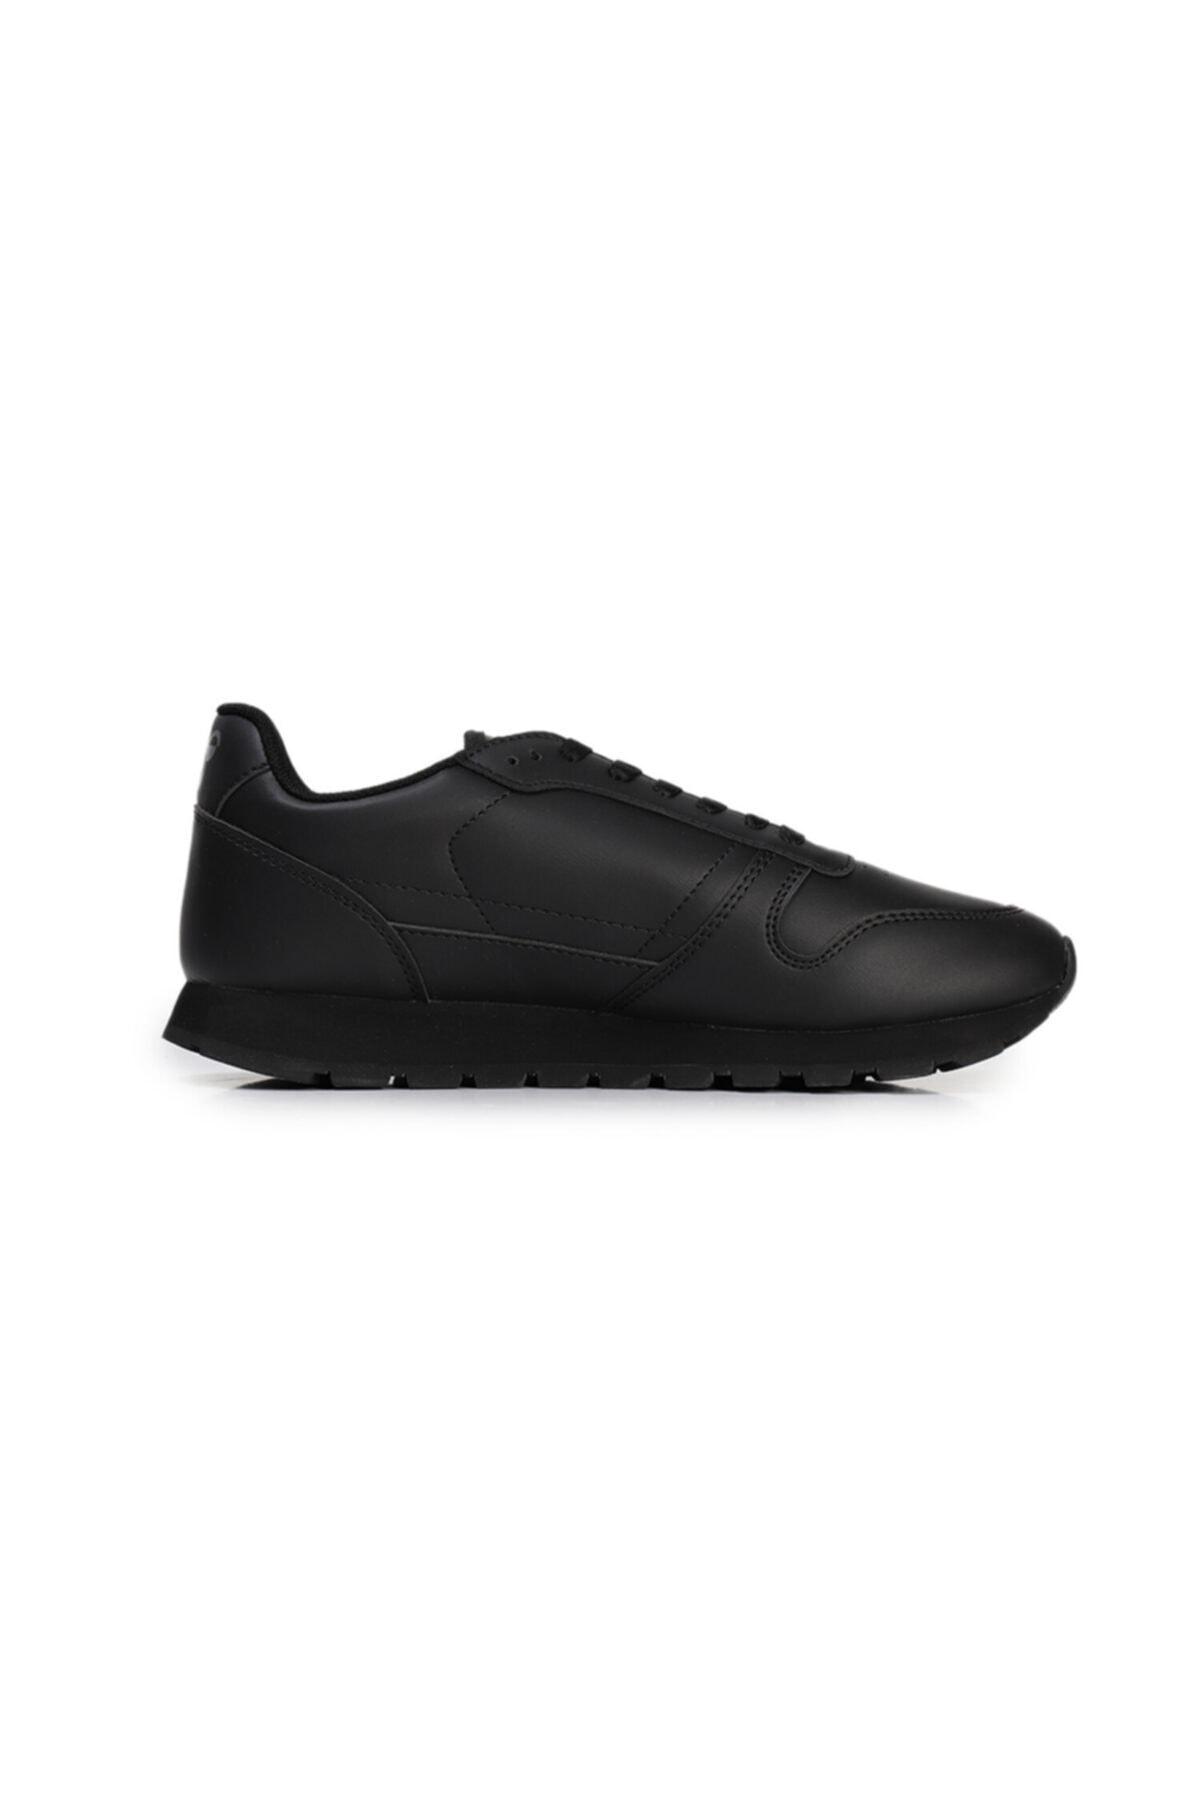 HUMMEL STREET Siyah Erkek Sneaker Ayakkabı 100351957 1